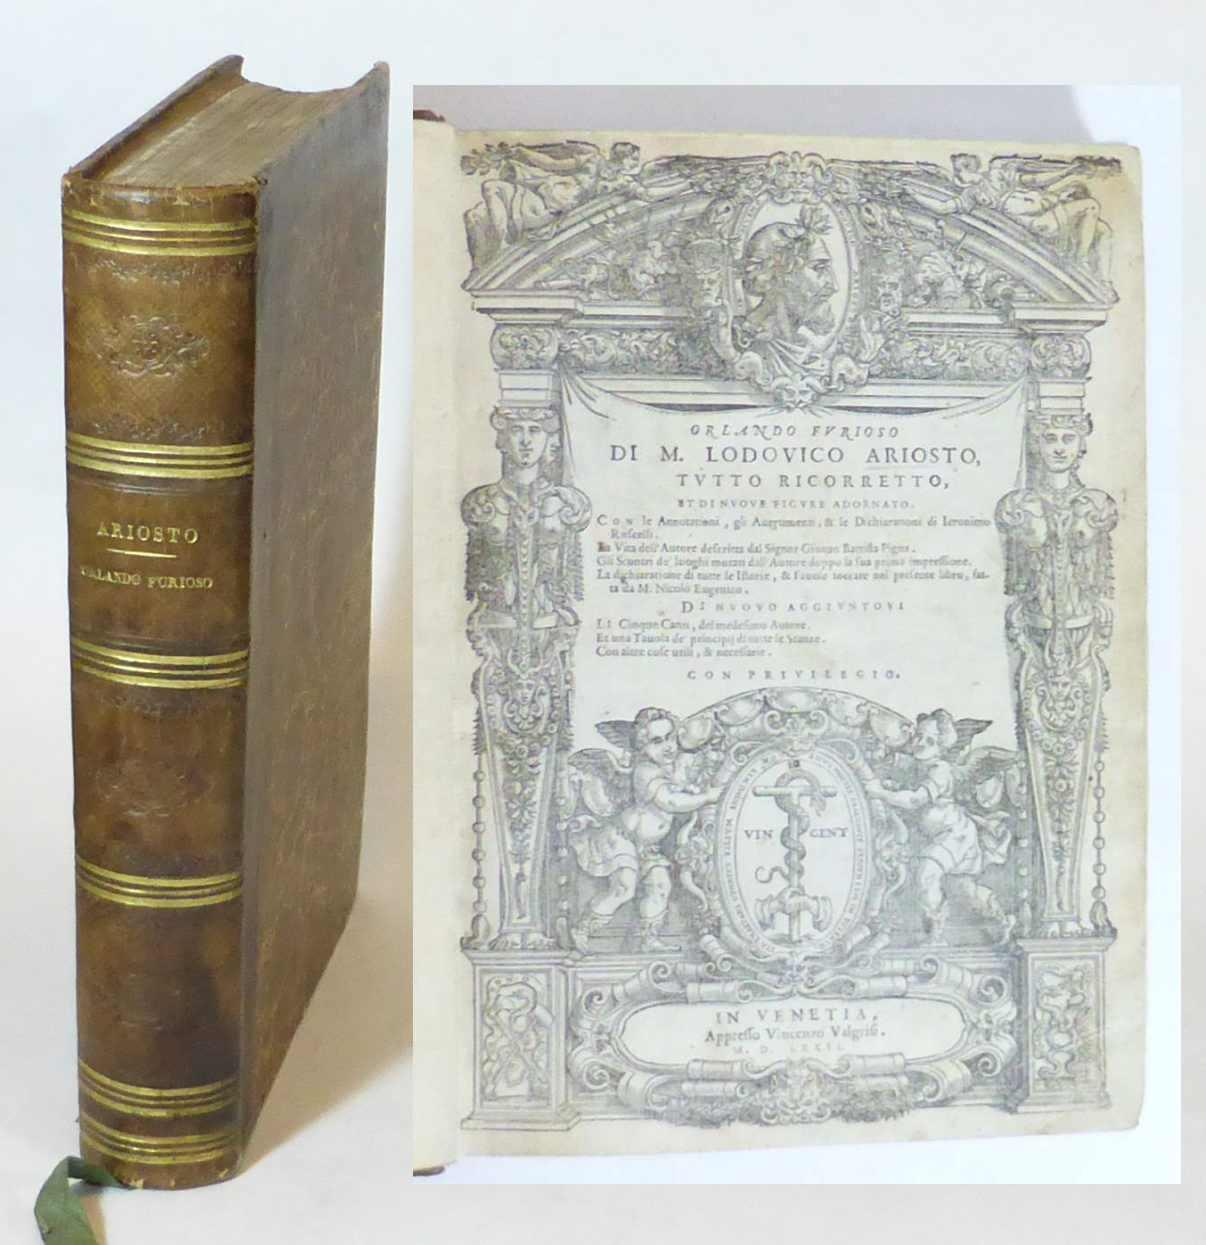 orl ando furioso volume ii cantos 25 46 ariosto ludovico